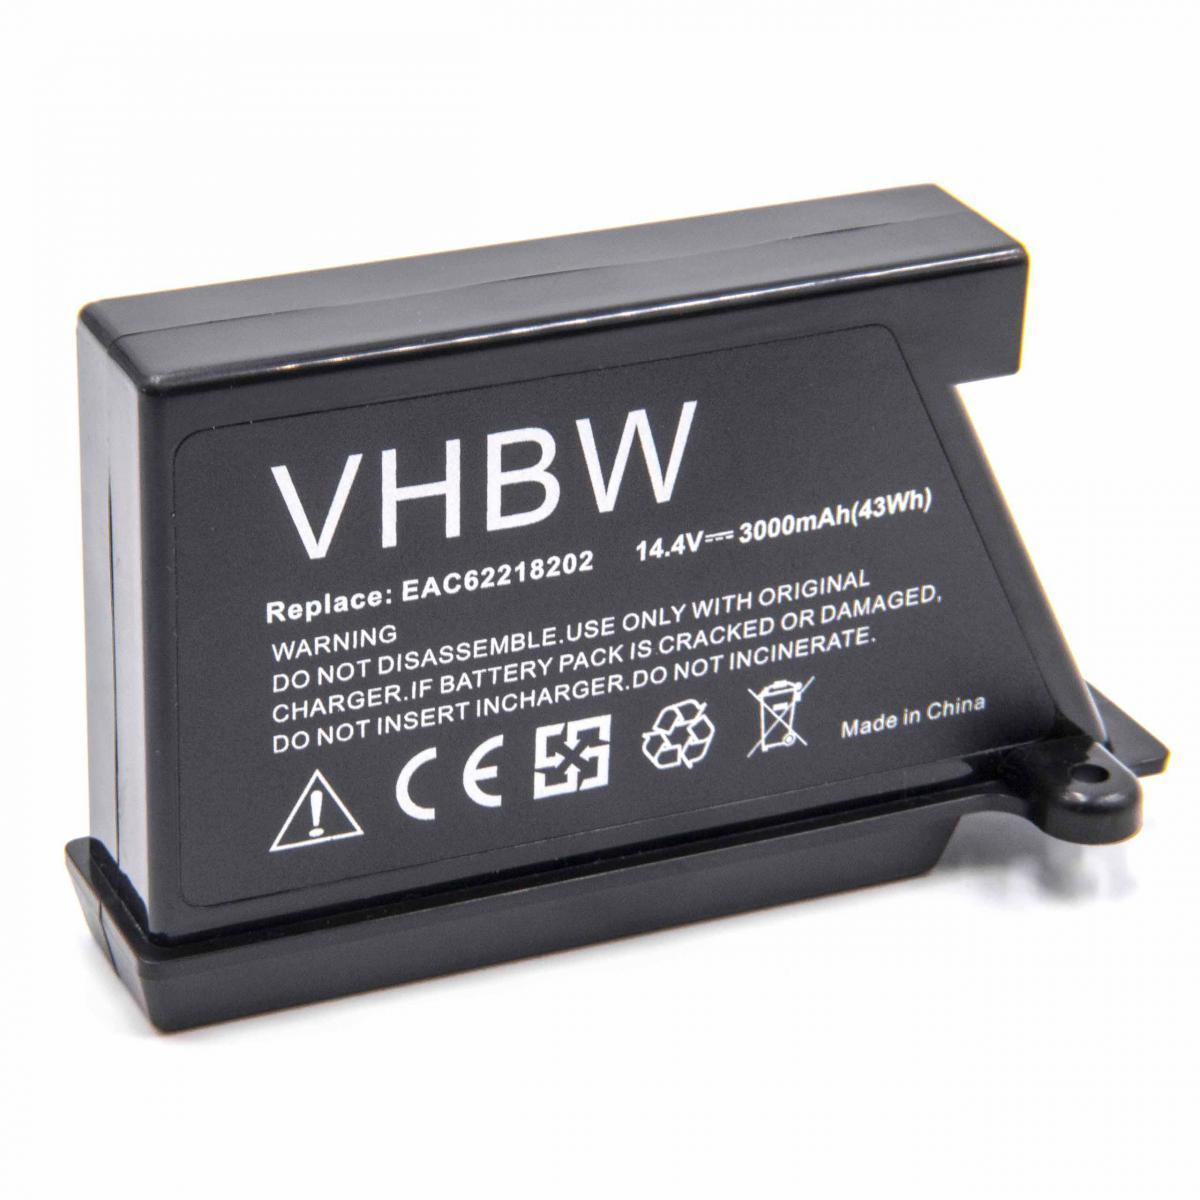 Vhbw vhbw Batterie compatible avec LG HOM-BOT VR64701LVM, VR64702LVMP, VR65502LV robot électroménager (3000mAh, 14,4V, Li-ion